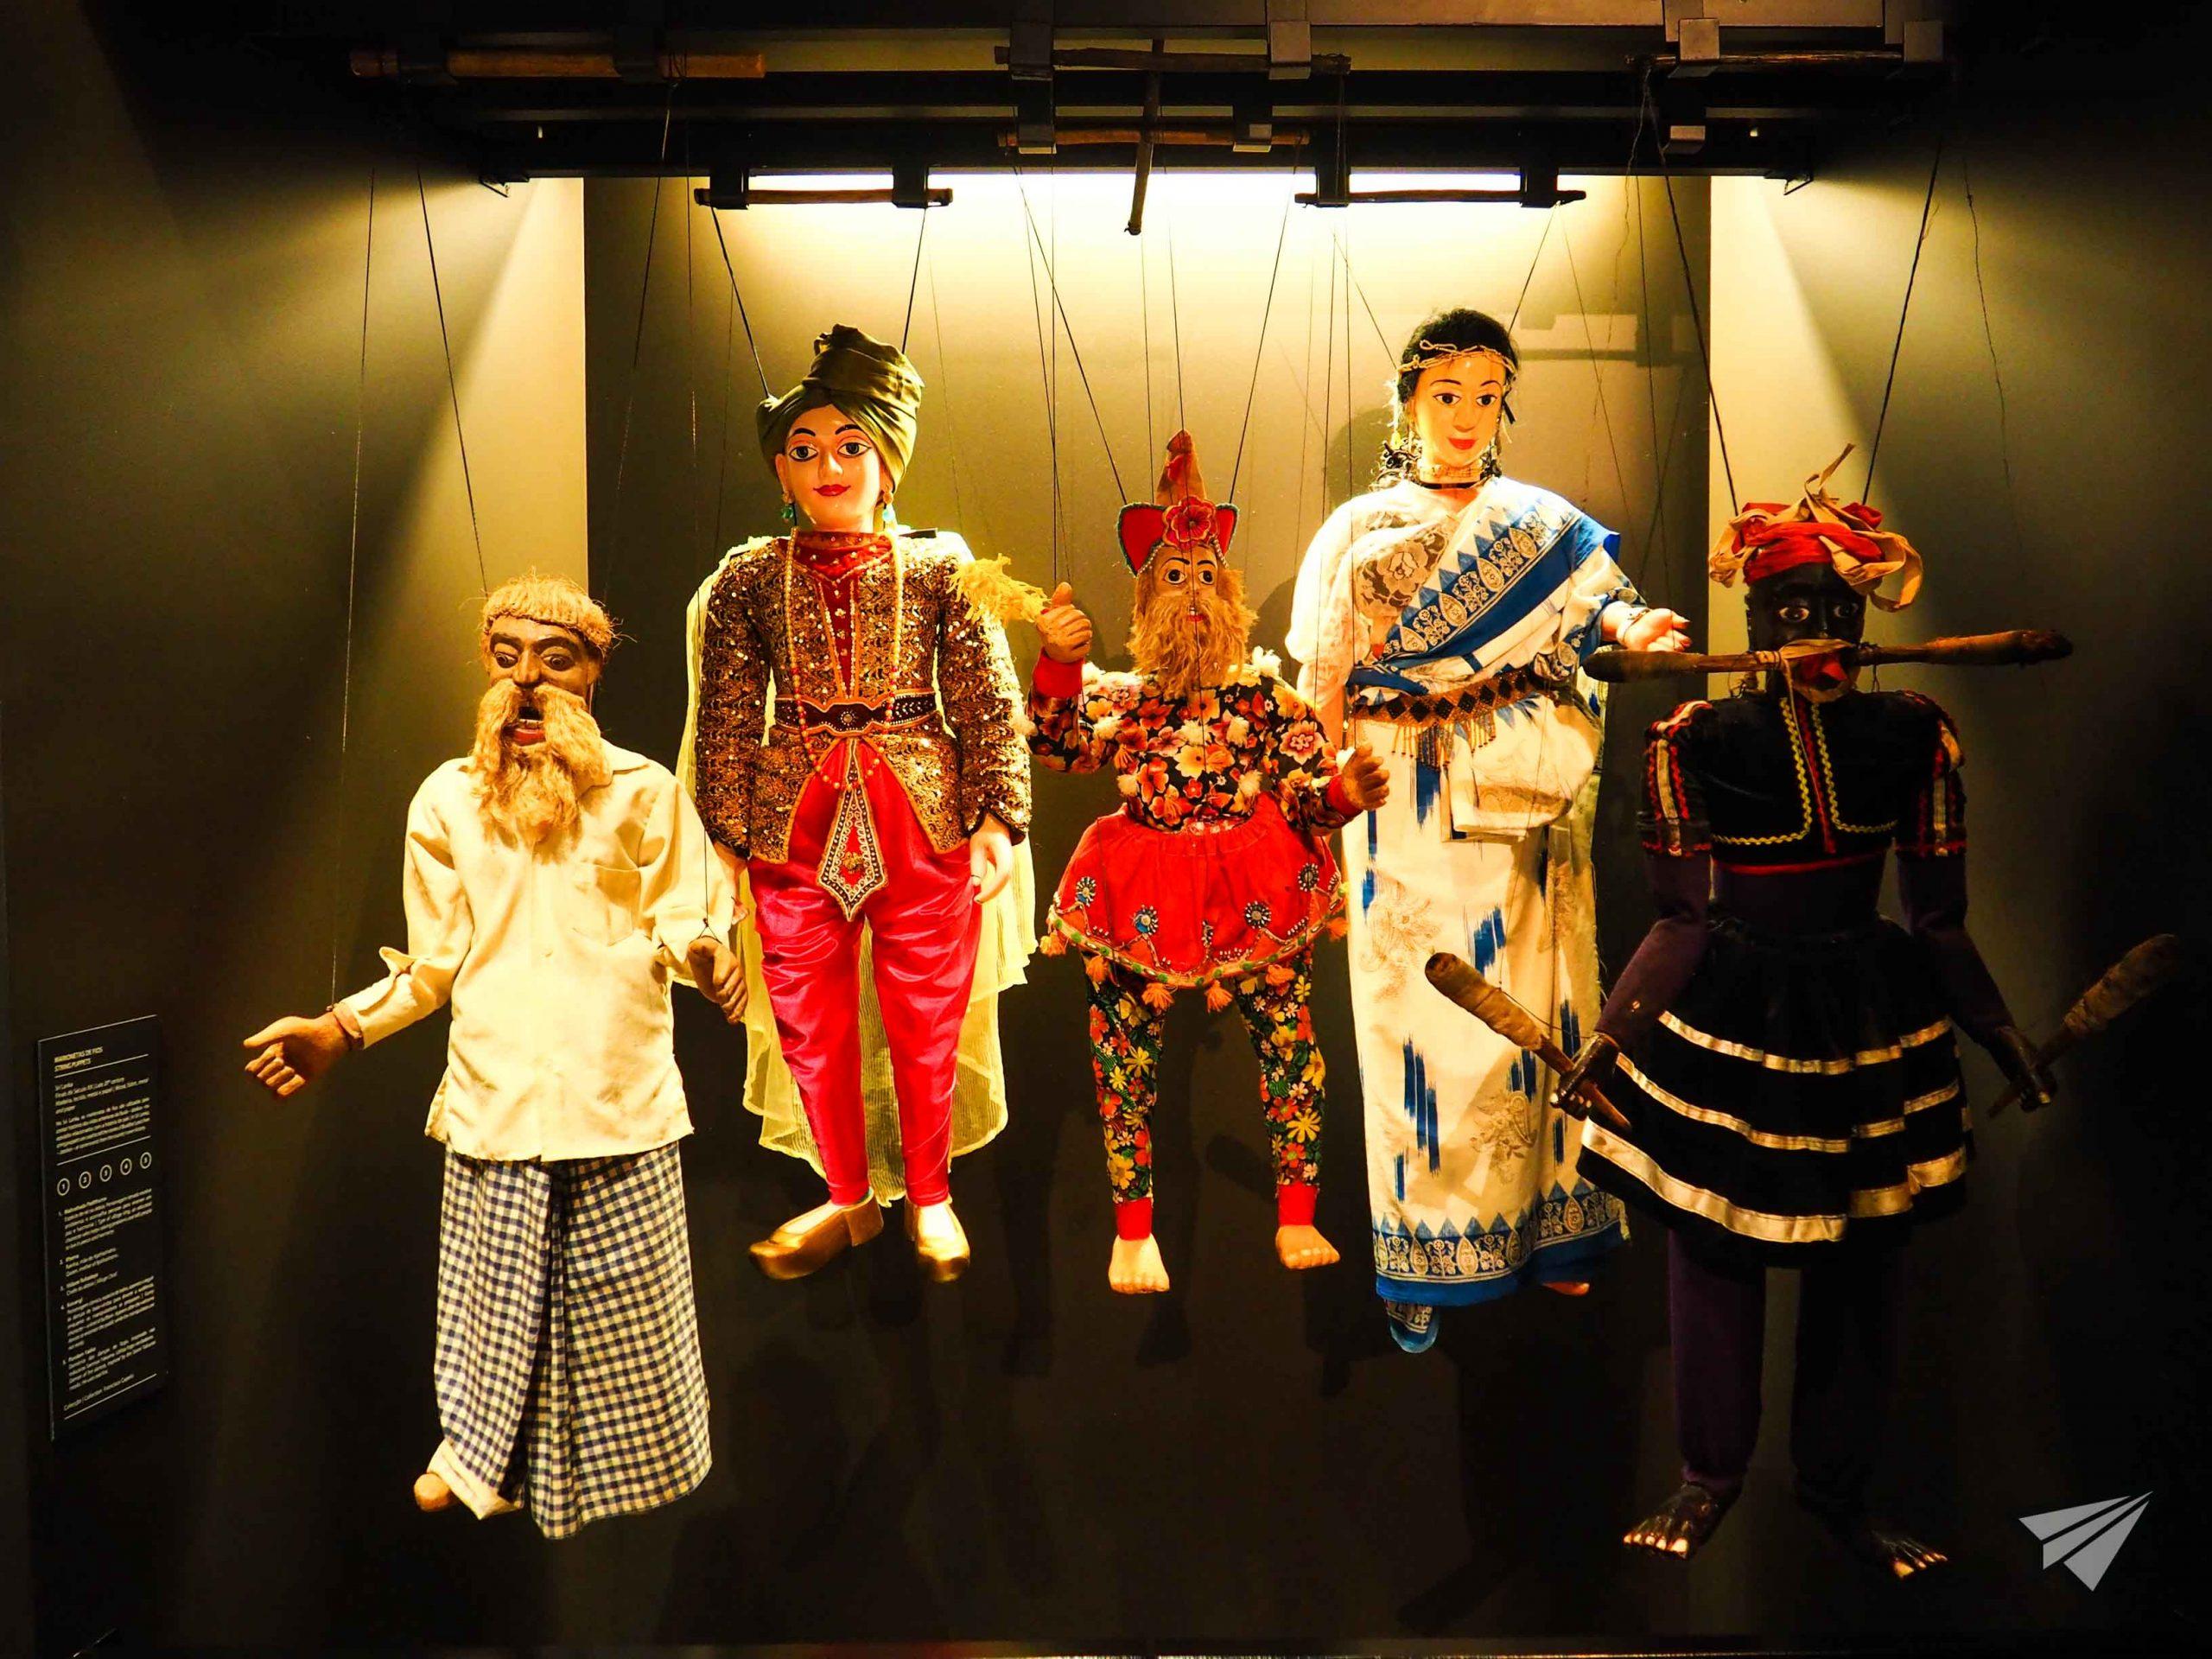 Museu da Marioneta doll